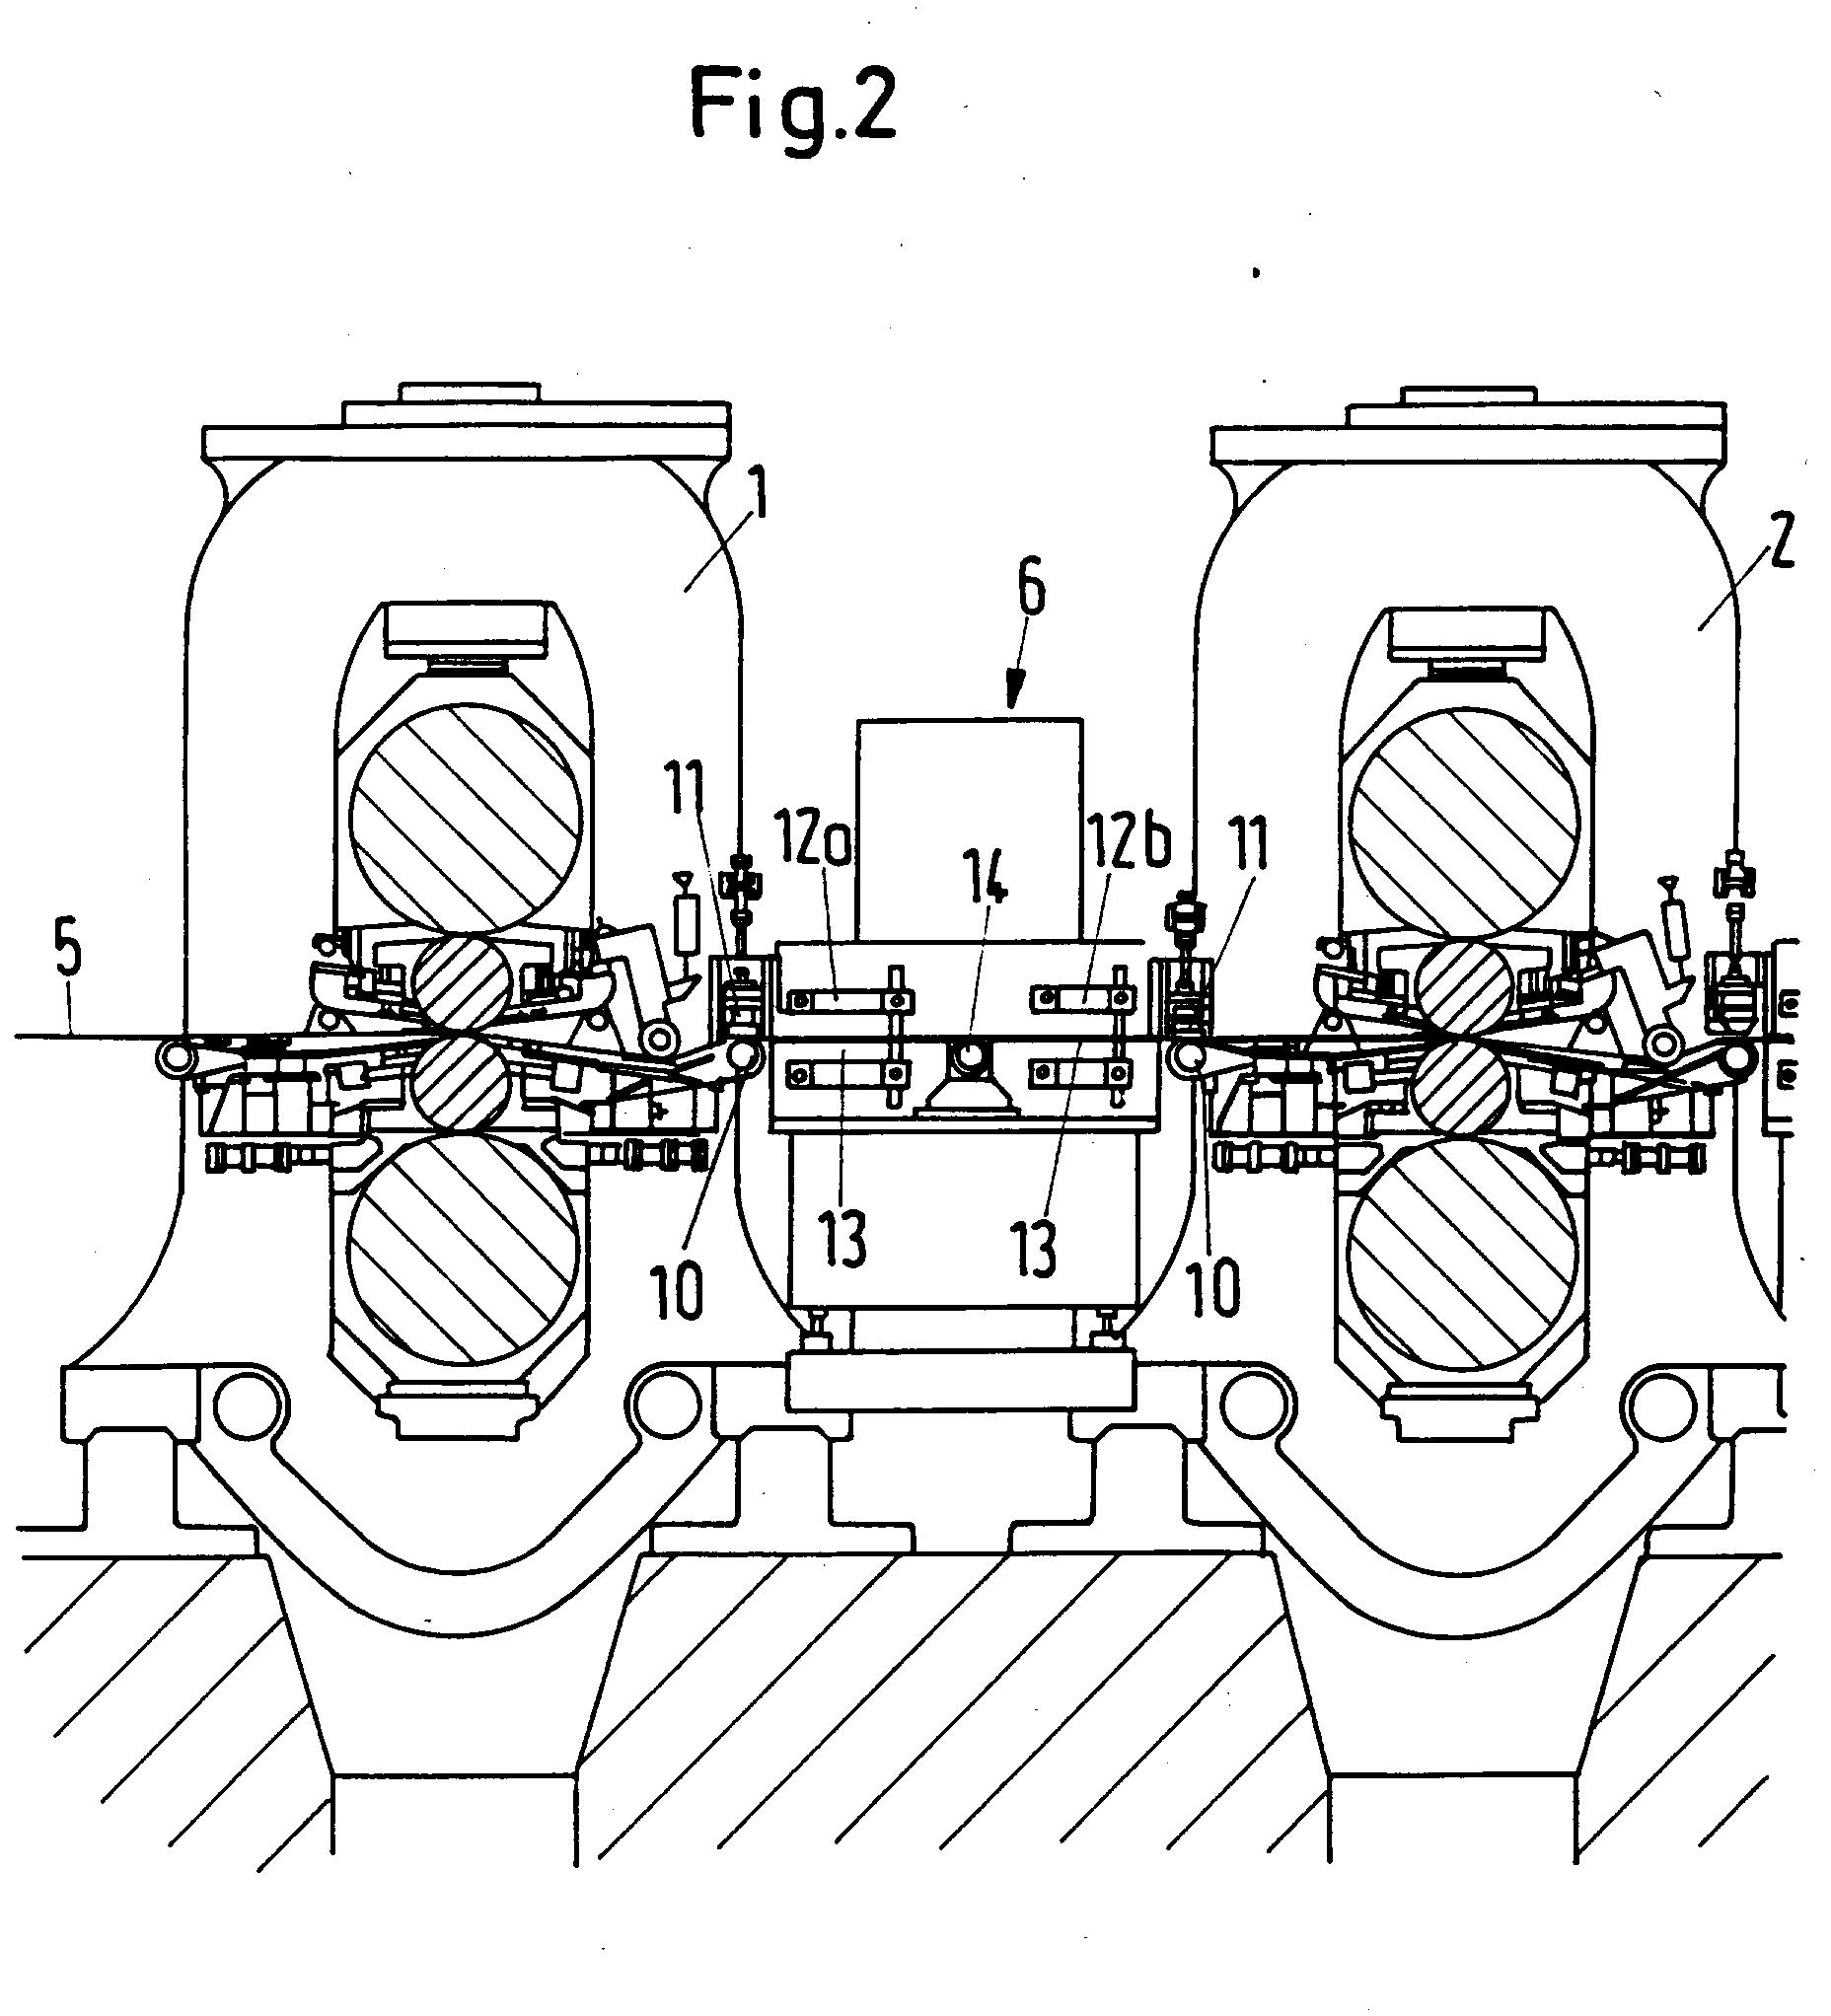 2003 Honda Shadow 750 Wiring Diagram